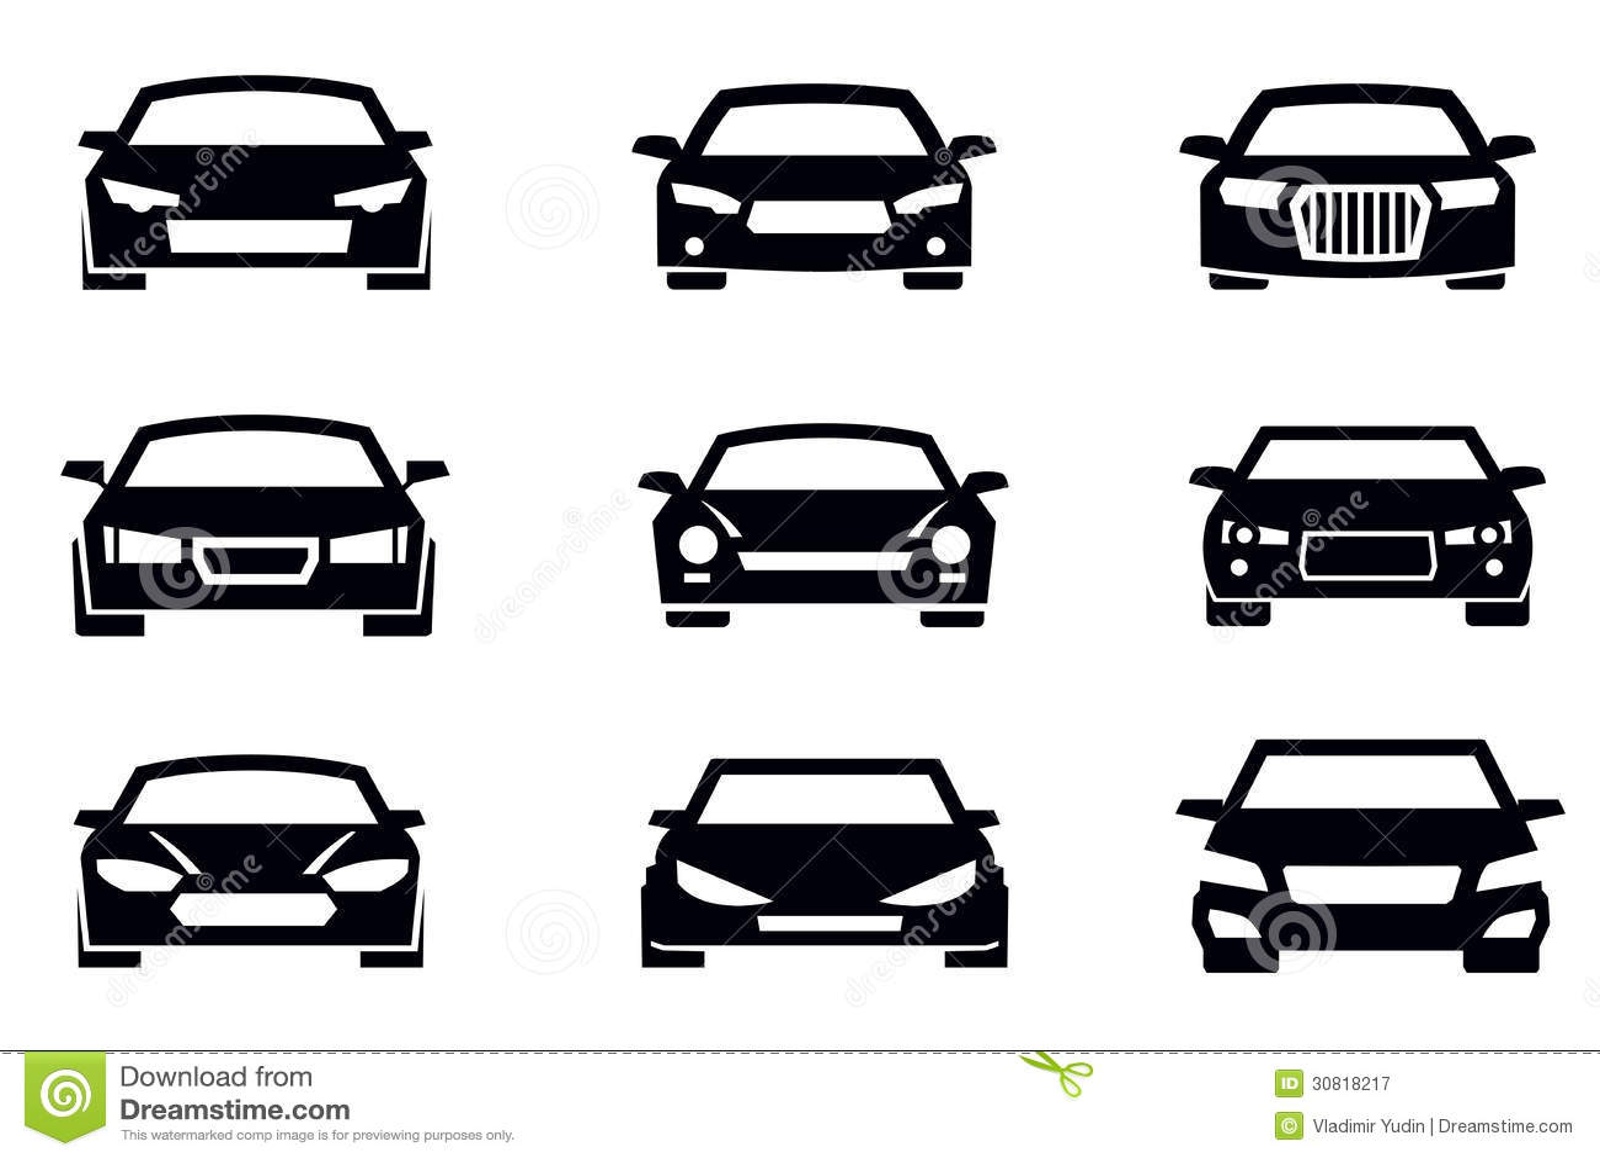 Car Service Business